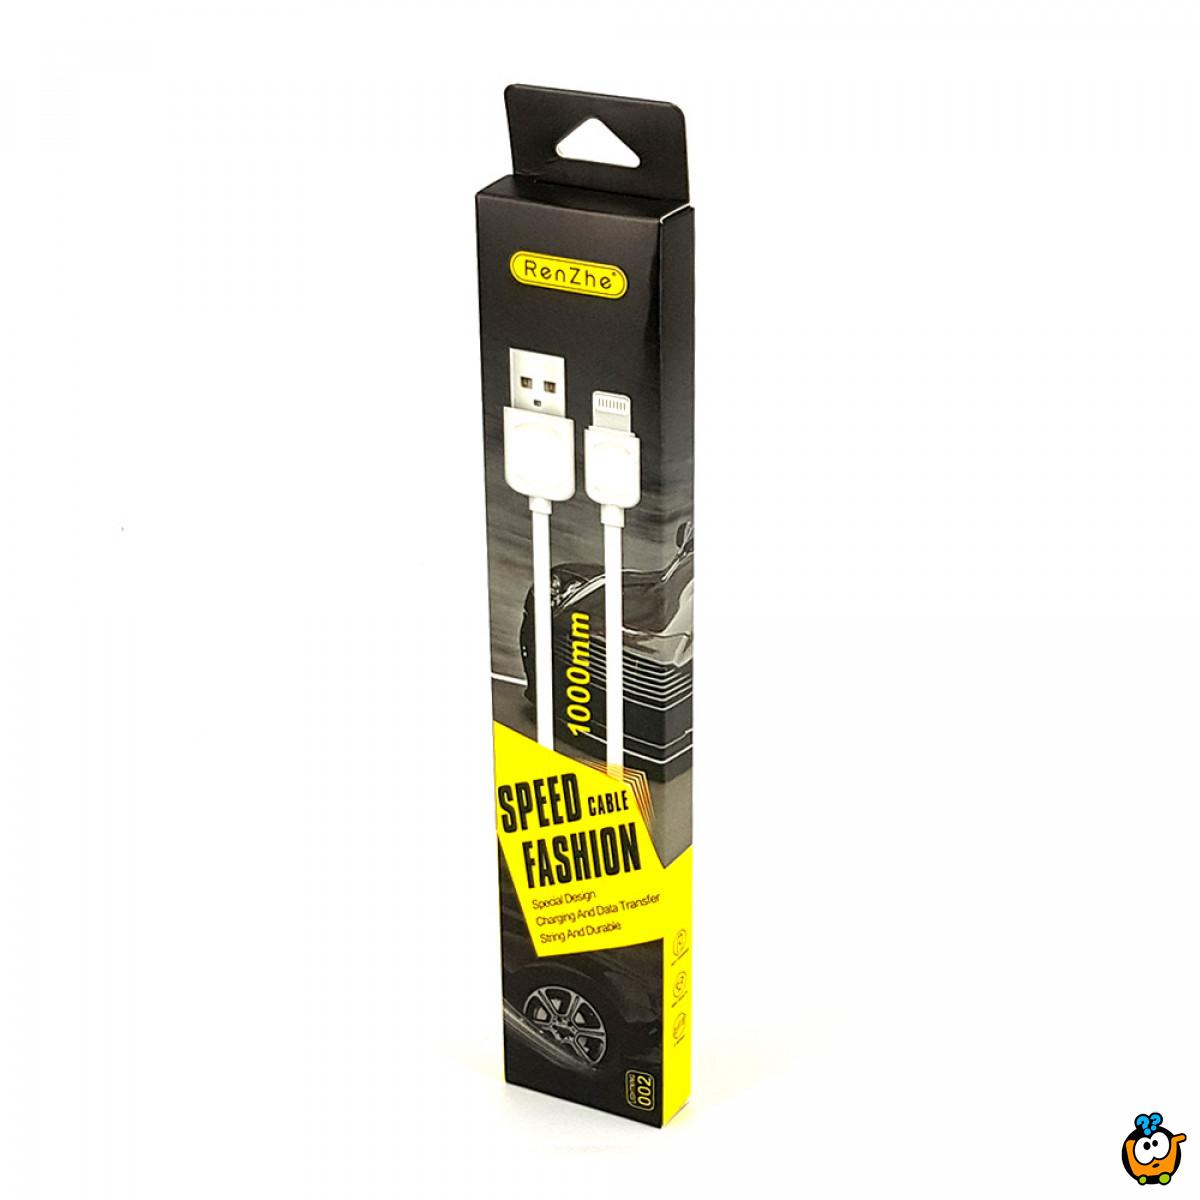 USB kabl za iphone